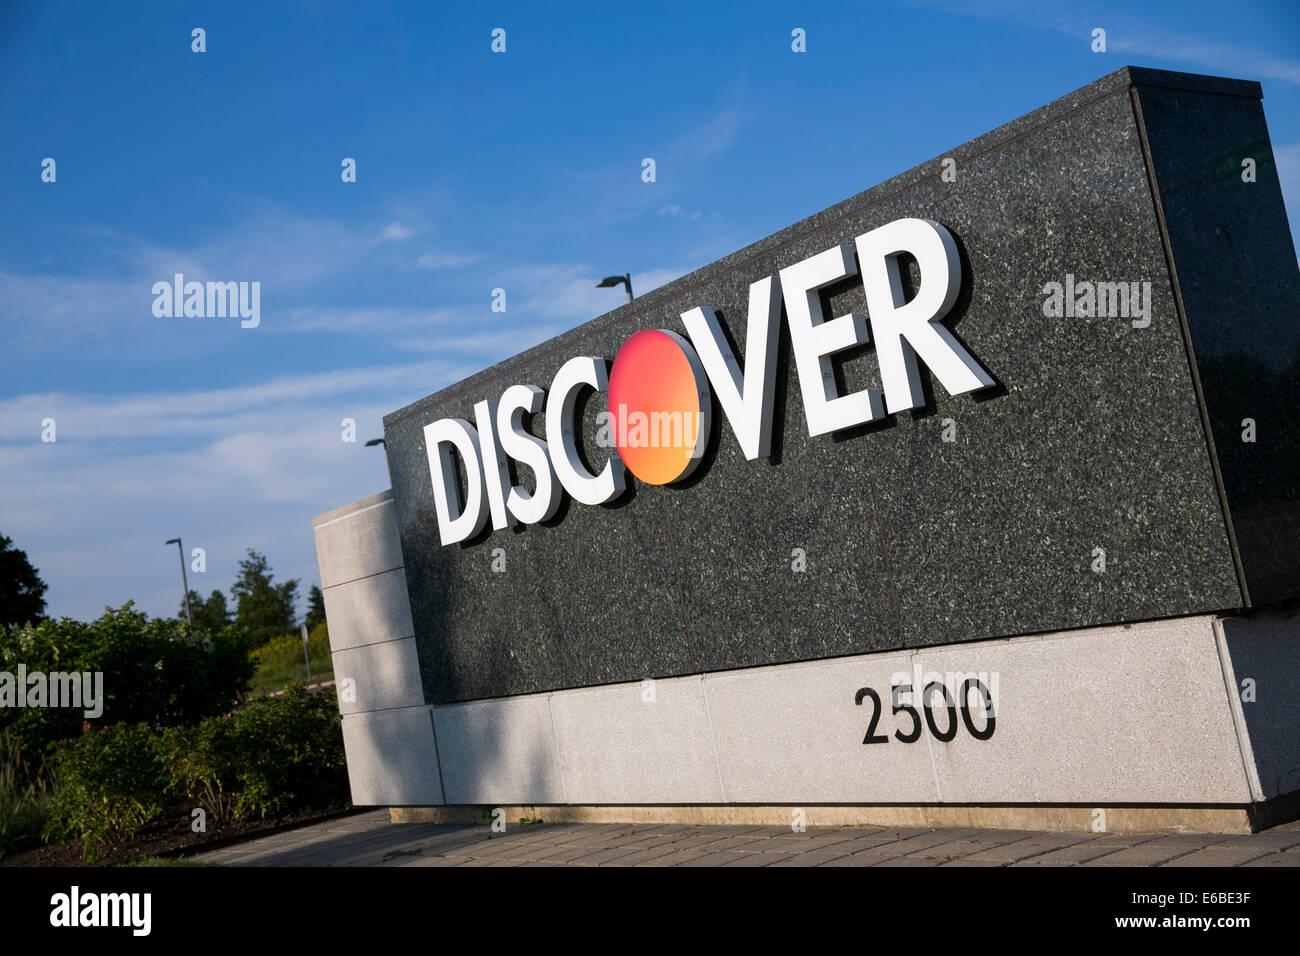 La sede de Discover Financial Services en Riverwoods, Illinois. Foto de stock